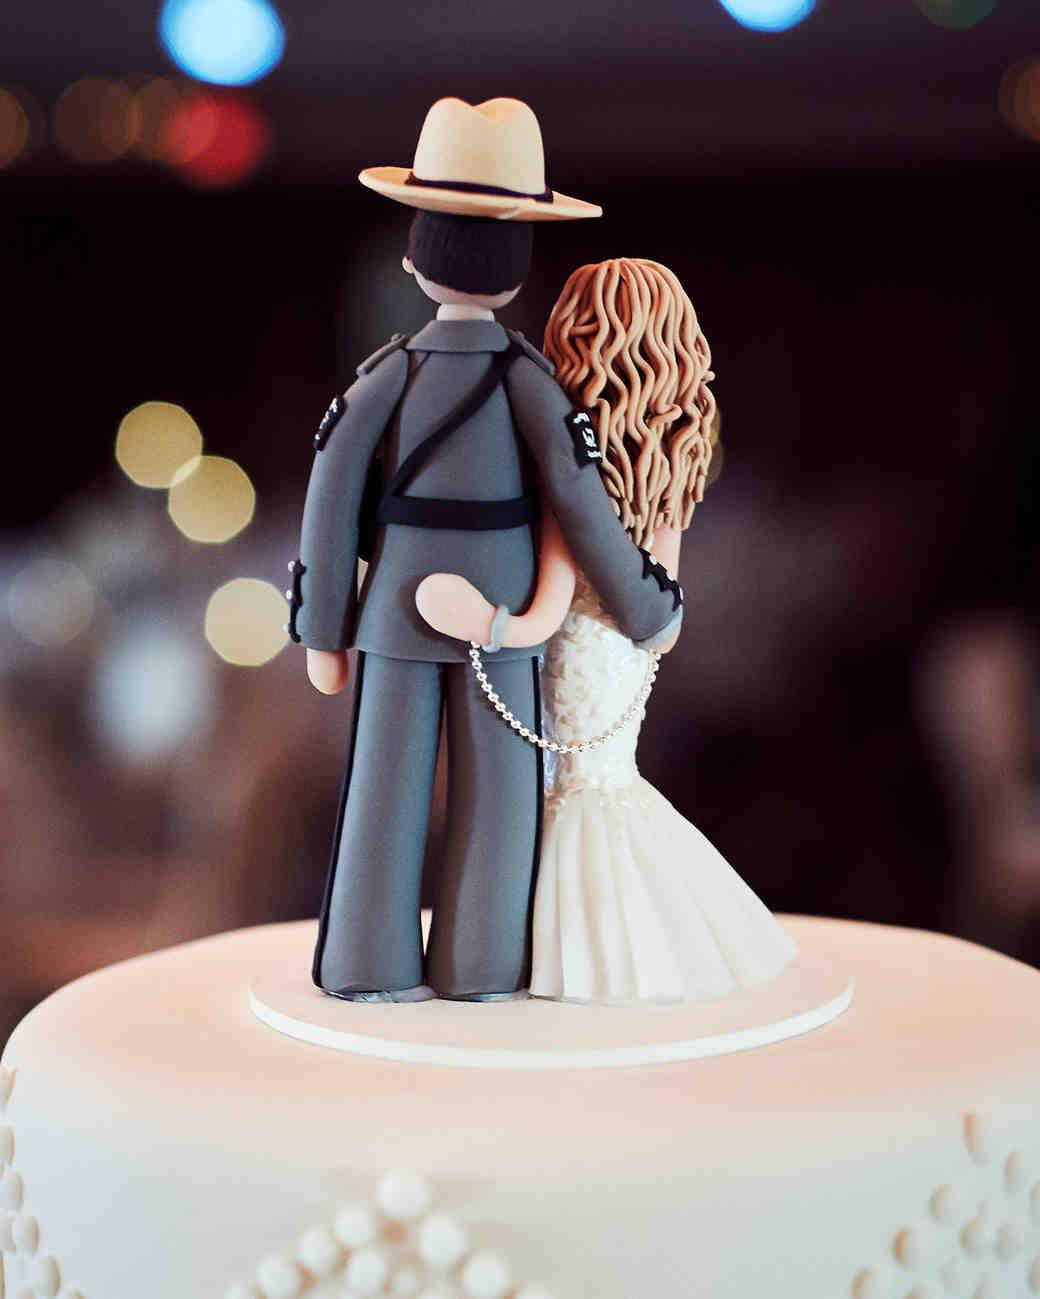 shqipe zenel wedding cake couple topper